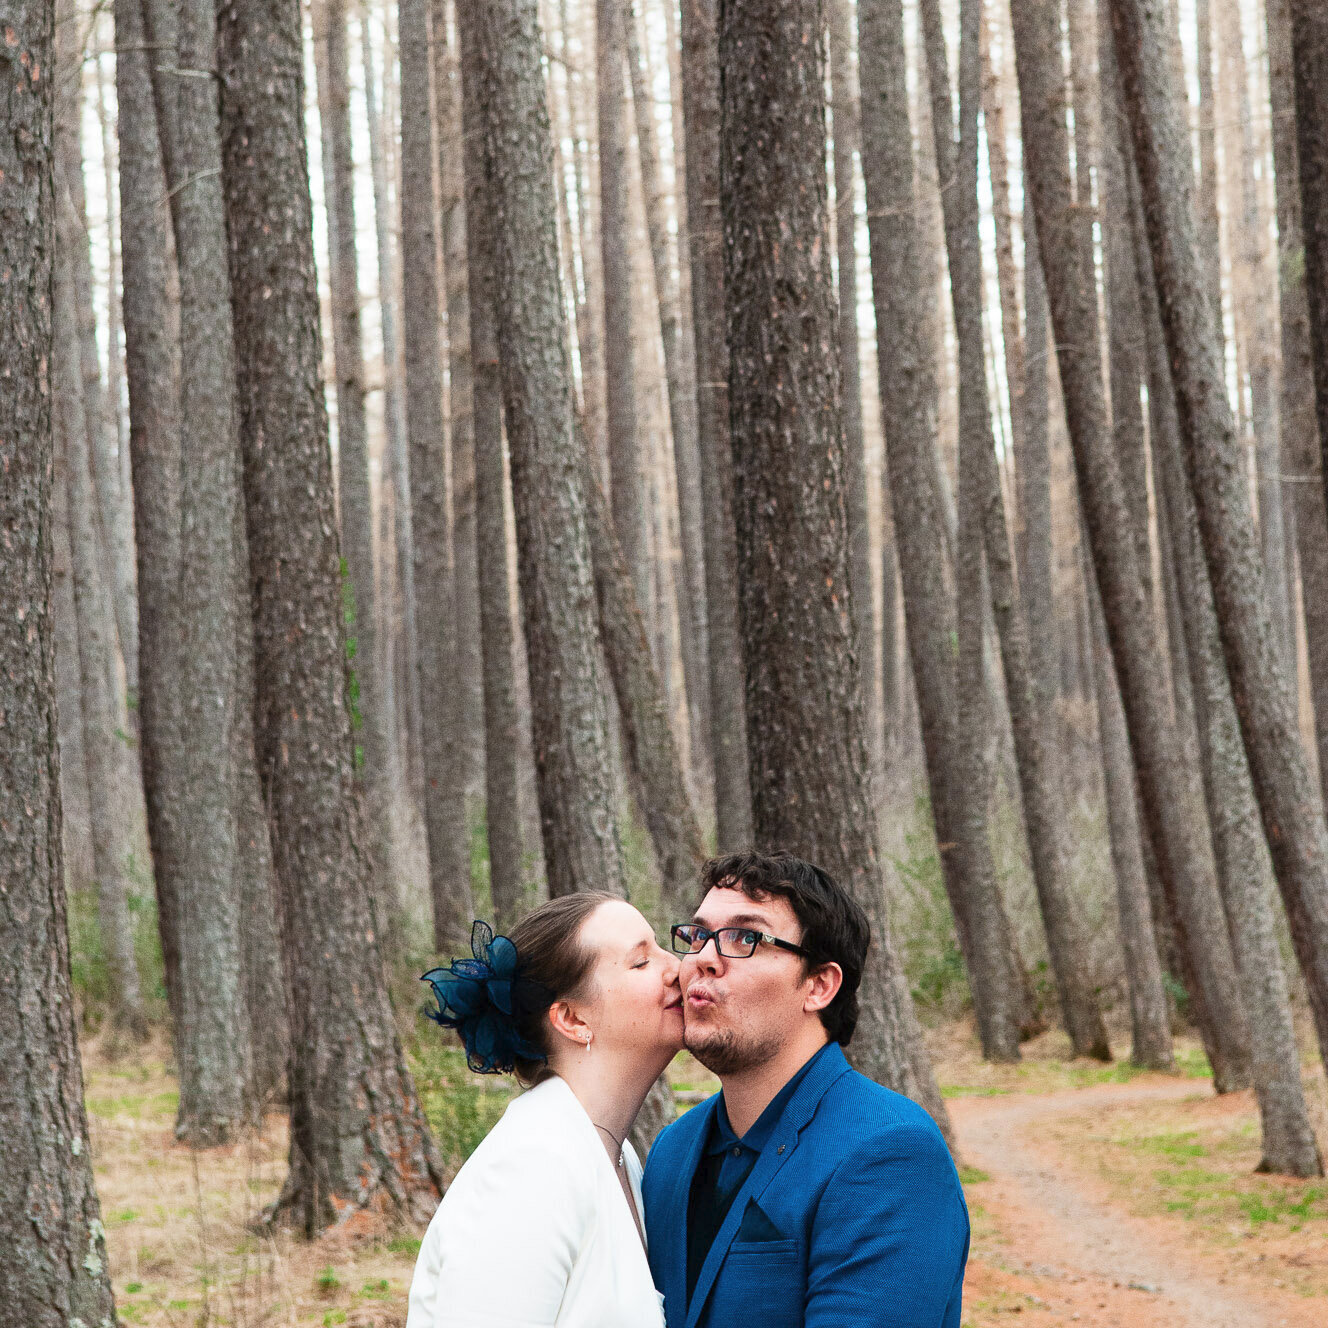 christchurch_wedding_photographer_thomas_pickard_0029.jpg